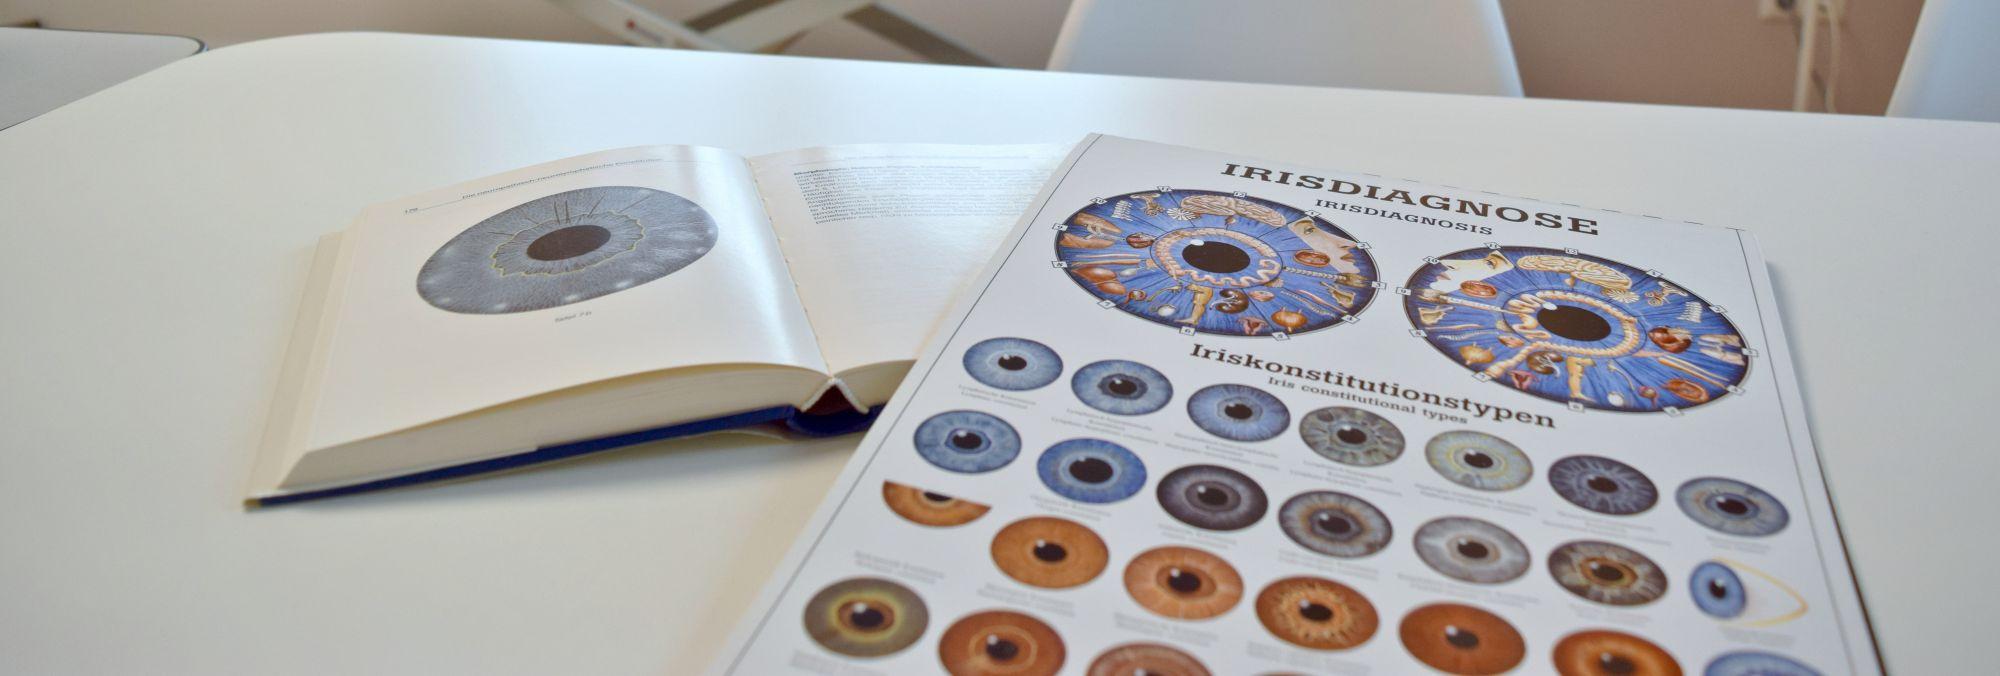 Augendiagnose Heilpraktiker